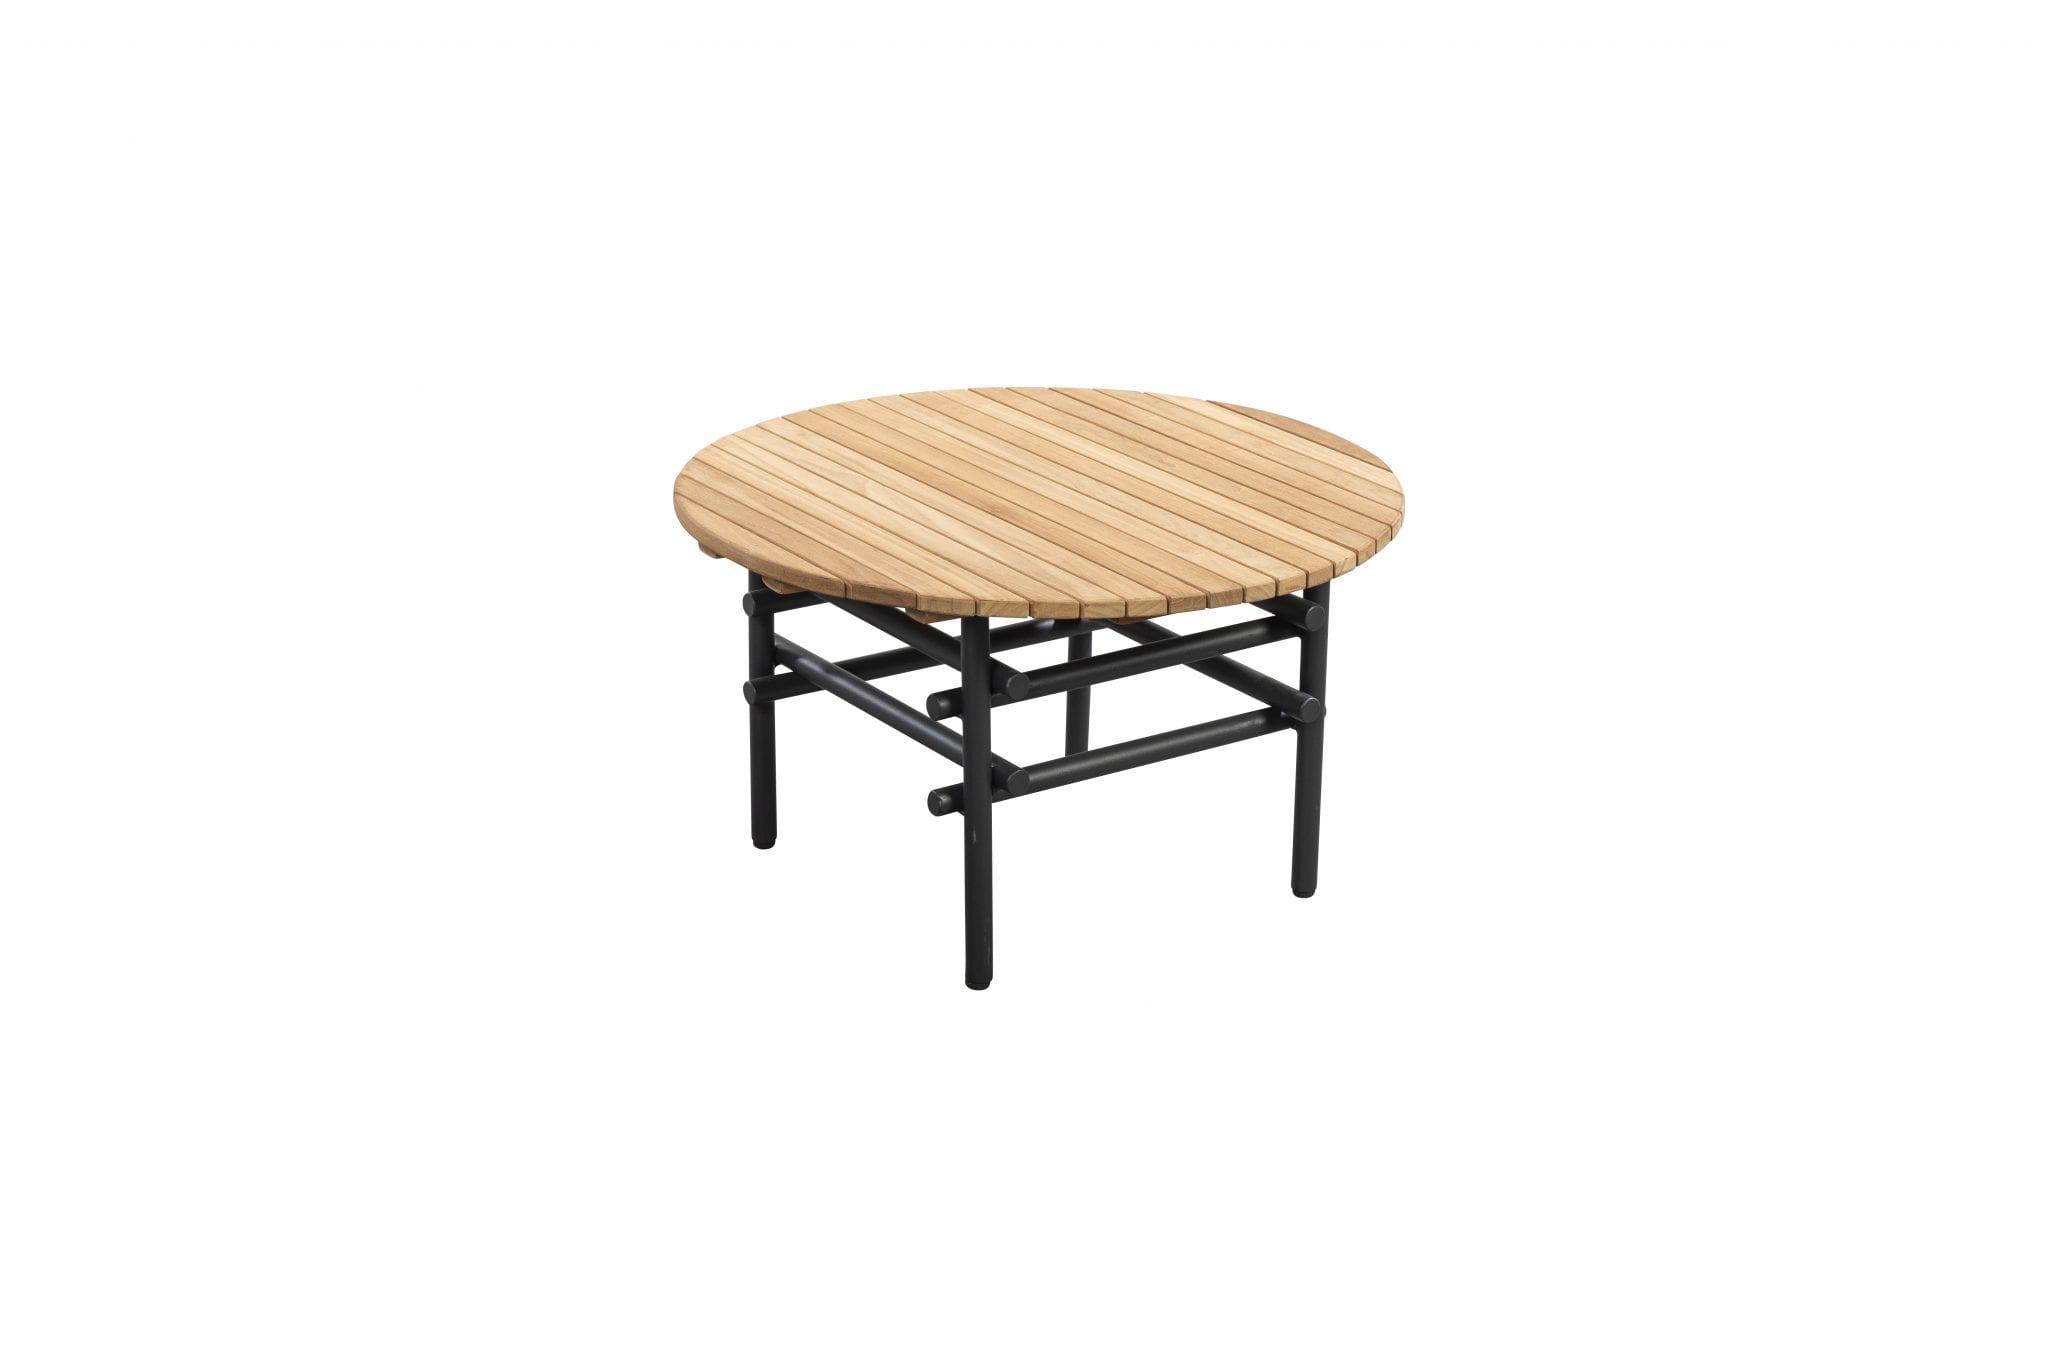 Ki side table grey + teak | YOI Furniture